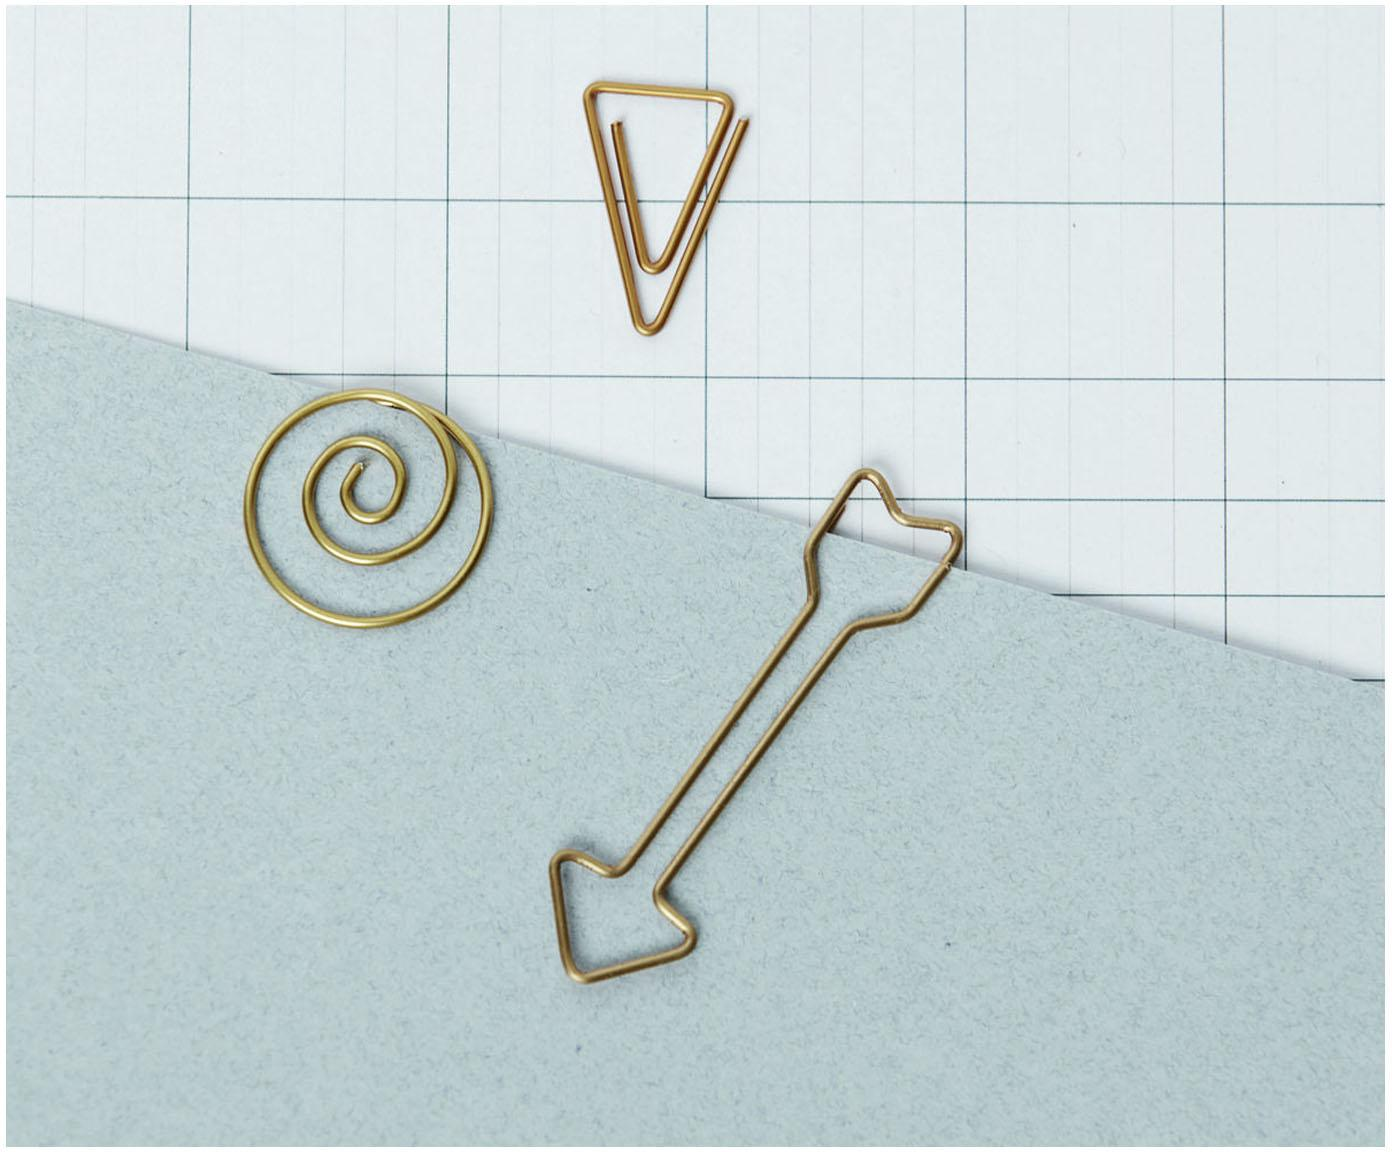 Büroklammern Shape, 15 Stück, Kupfer, Kupfer, L 3 cm